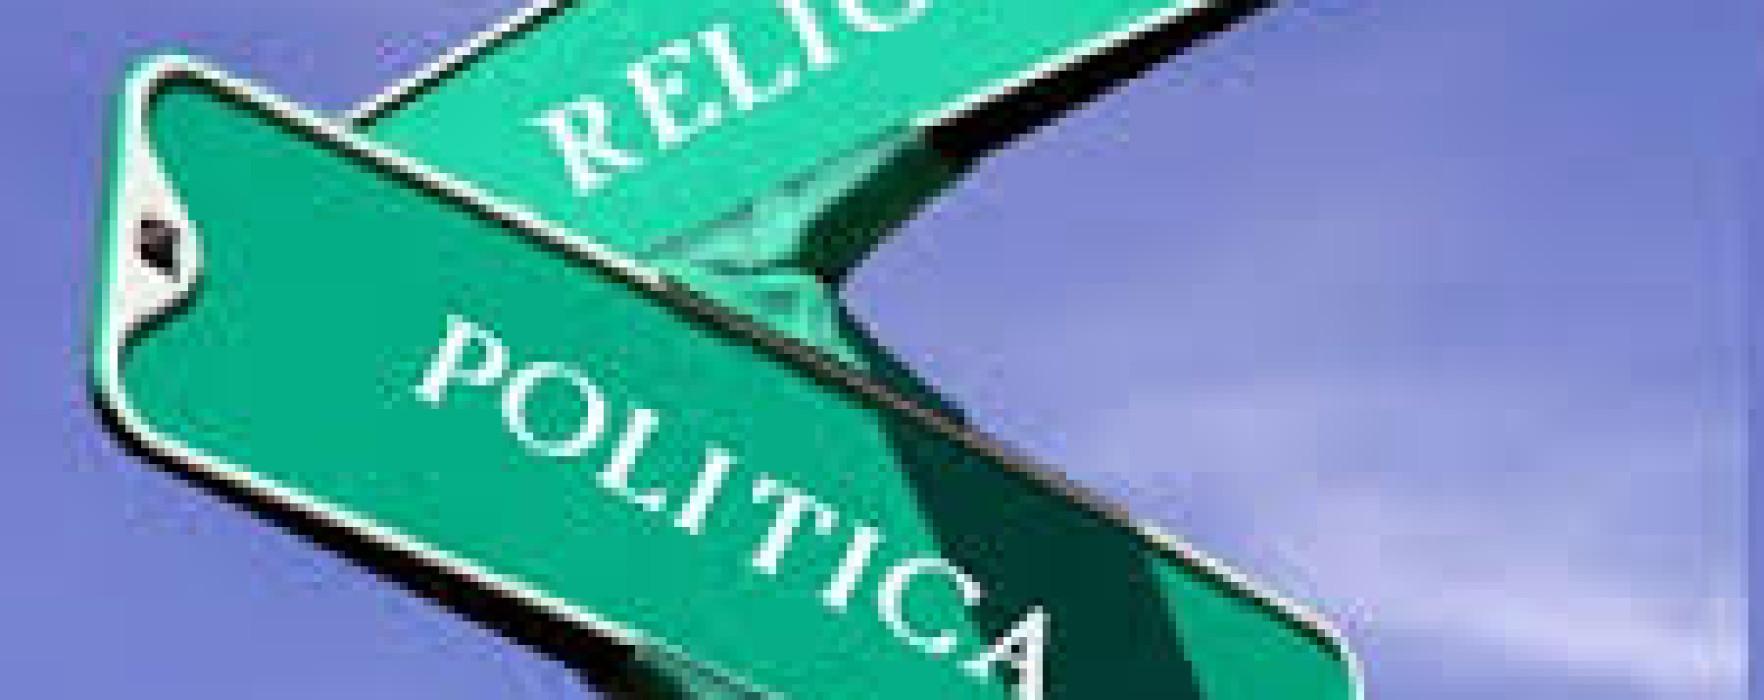 CATTOLICI IN POLITICA POST 01